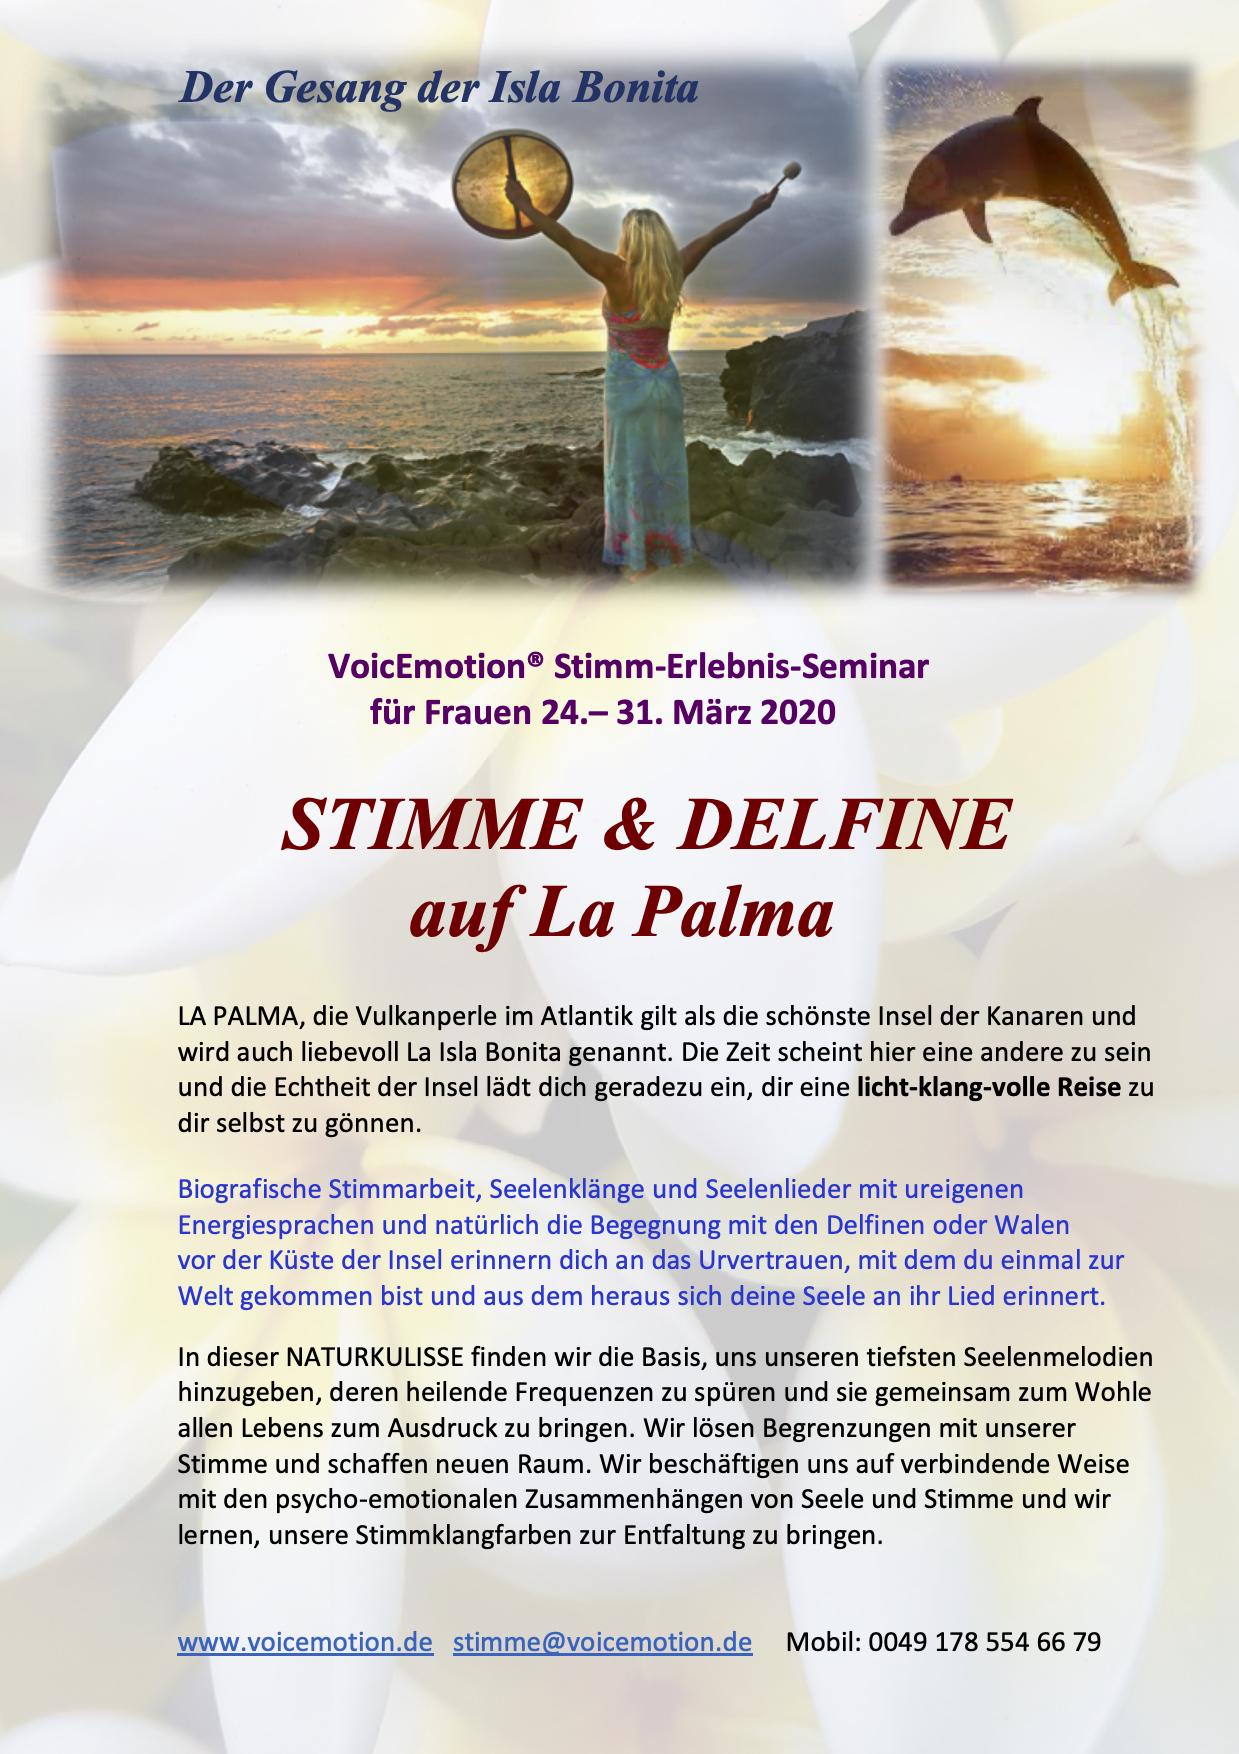 STIMME & DELFINE auf La Palma